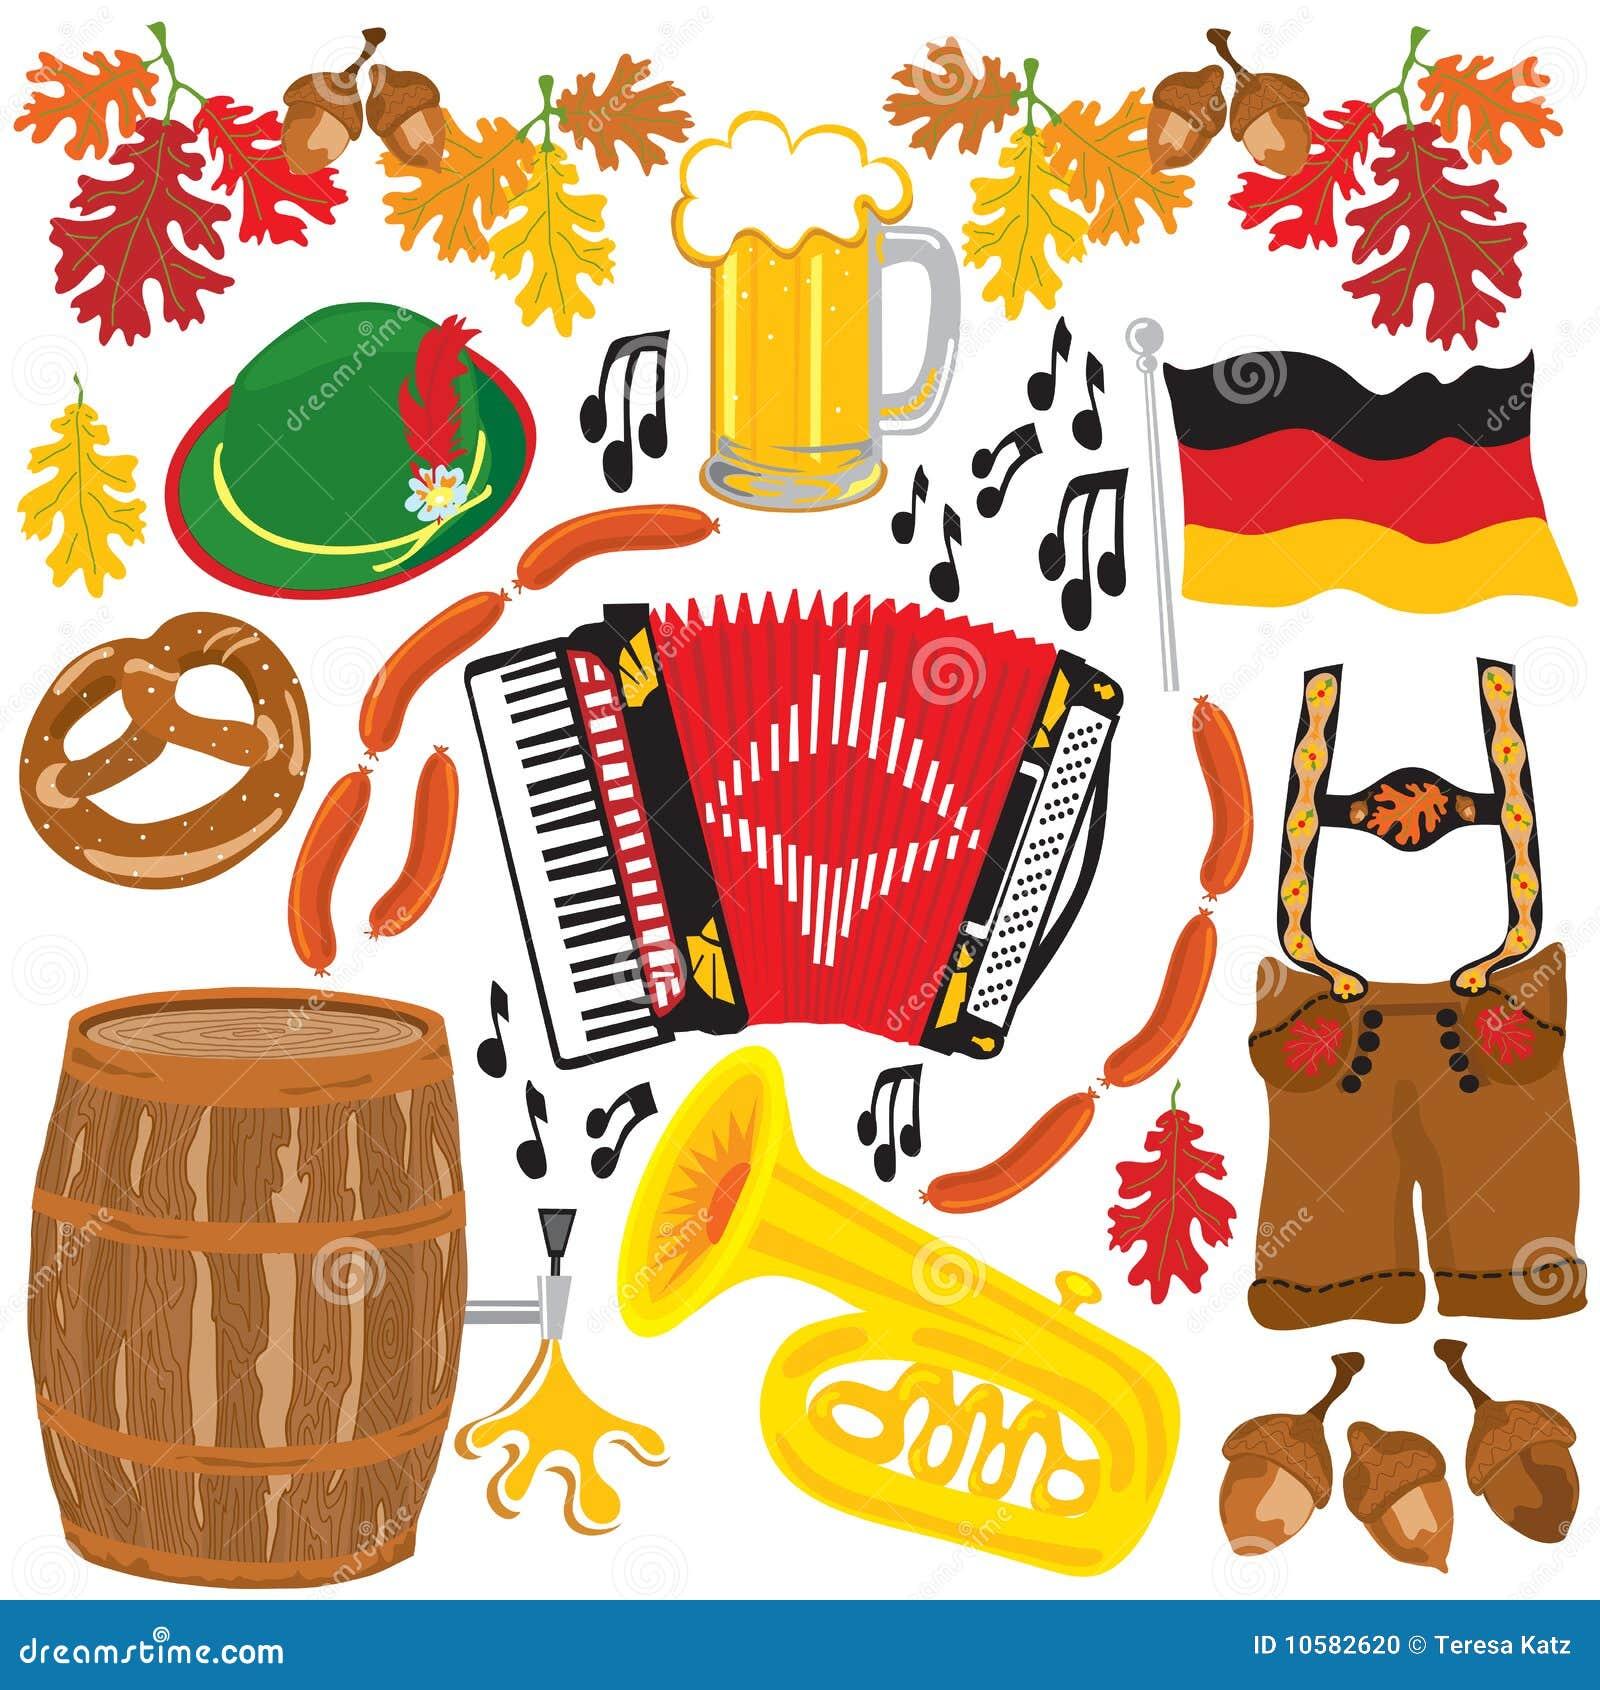 oktoberfest party clipart elements stock vector image fall leaves free clip art border fall border free clip art